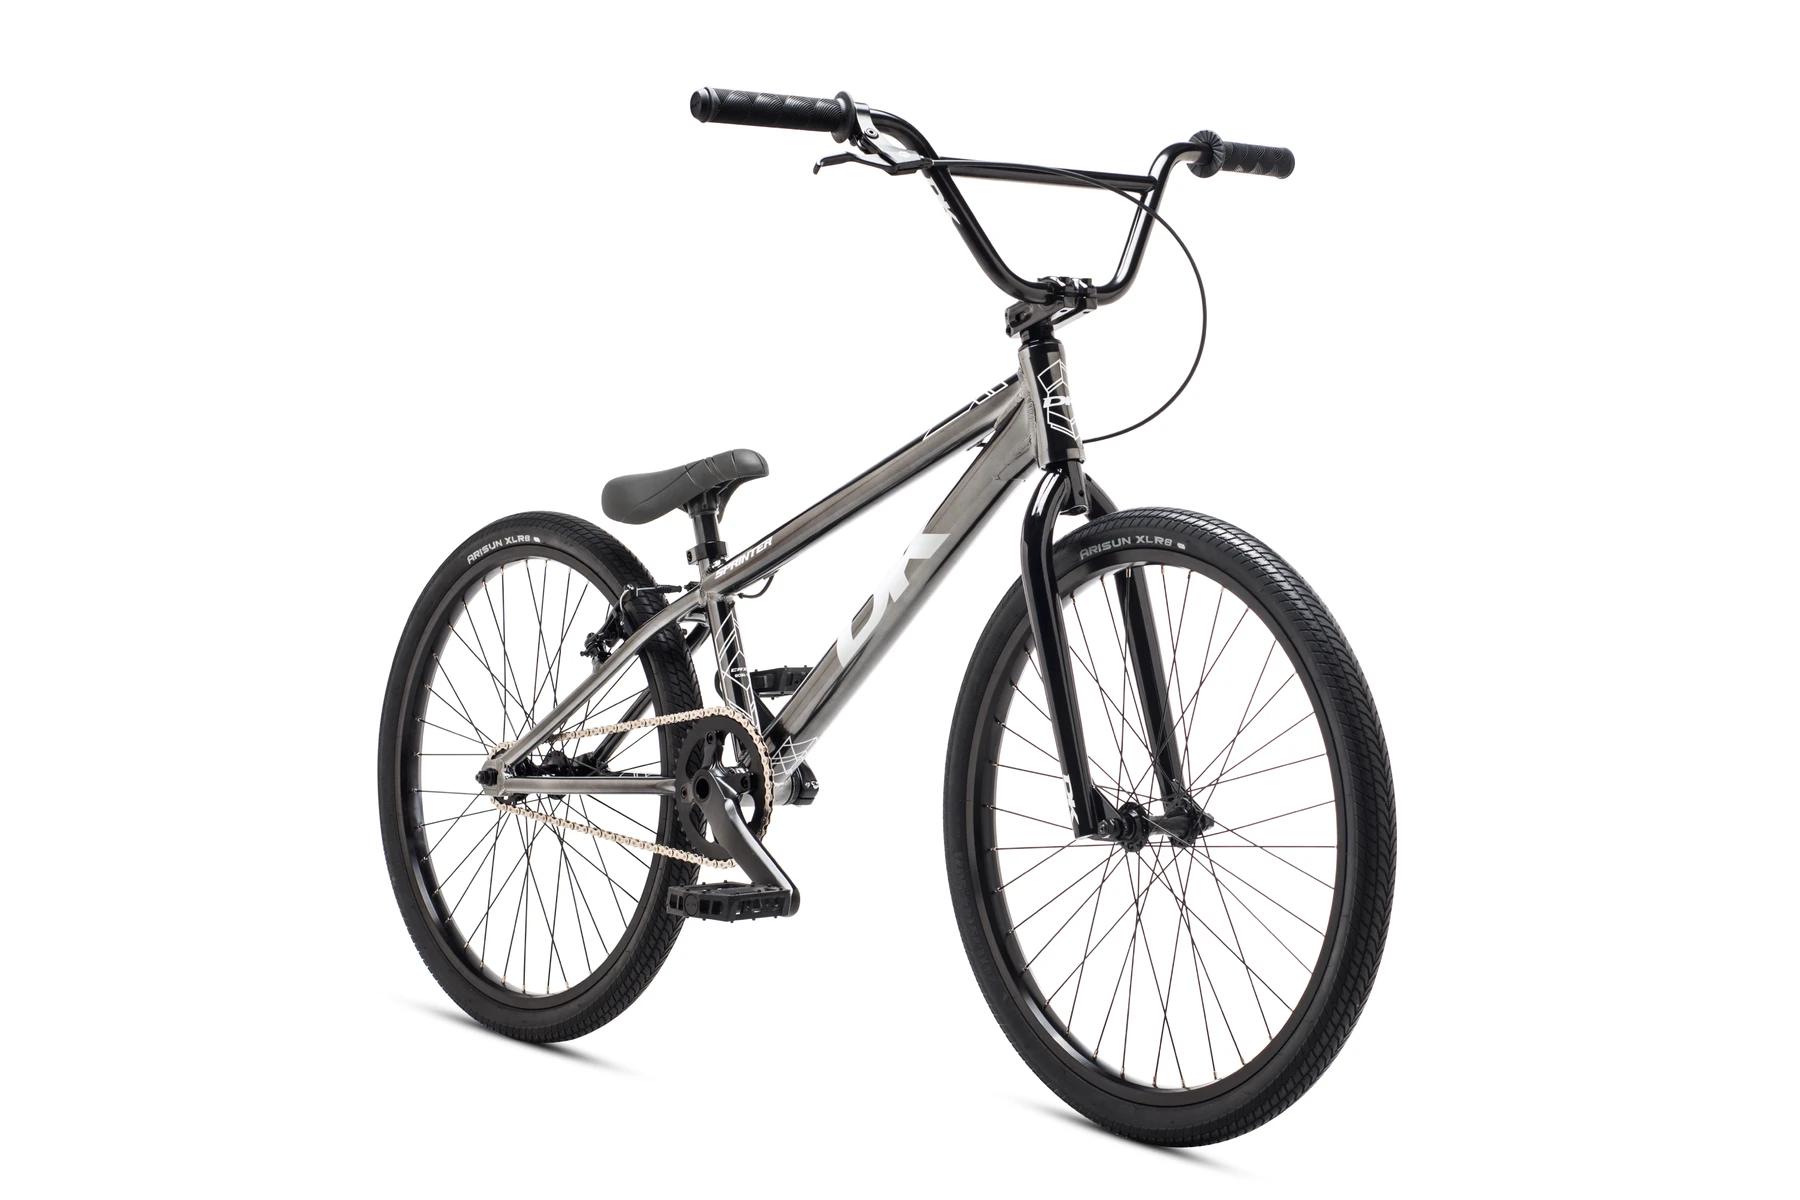 SPRINTER-Expert-Grey-3qtr-B2c_1800x1800